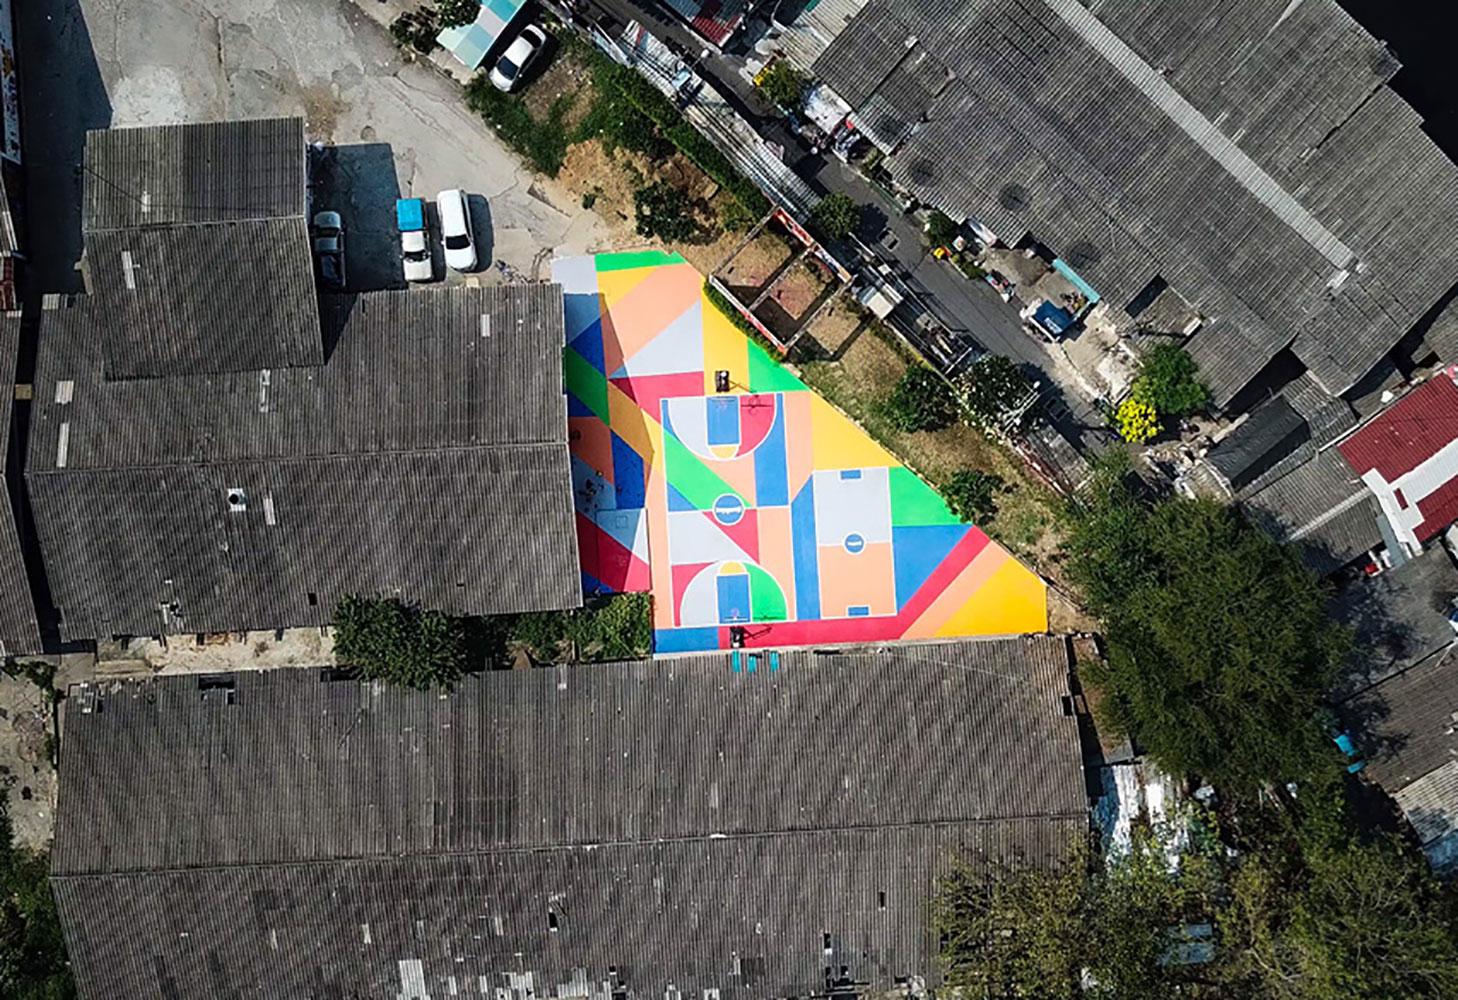 Funky basketball filming location in Bangkok Thailand